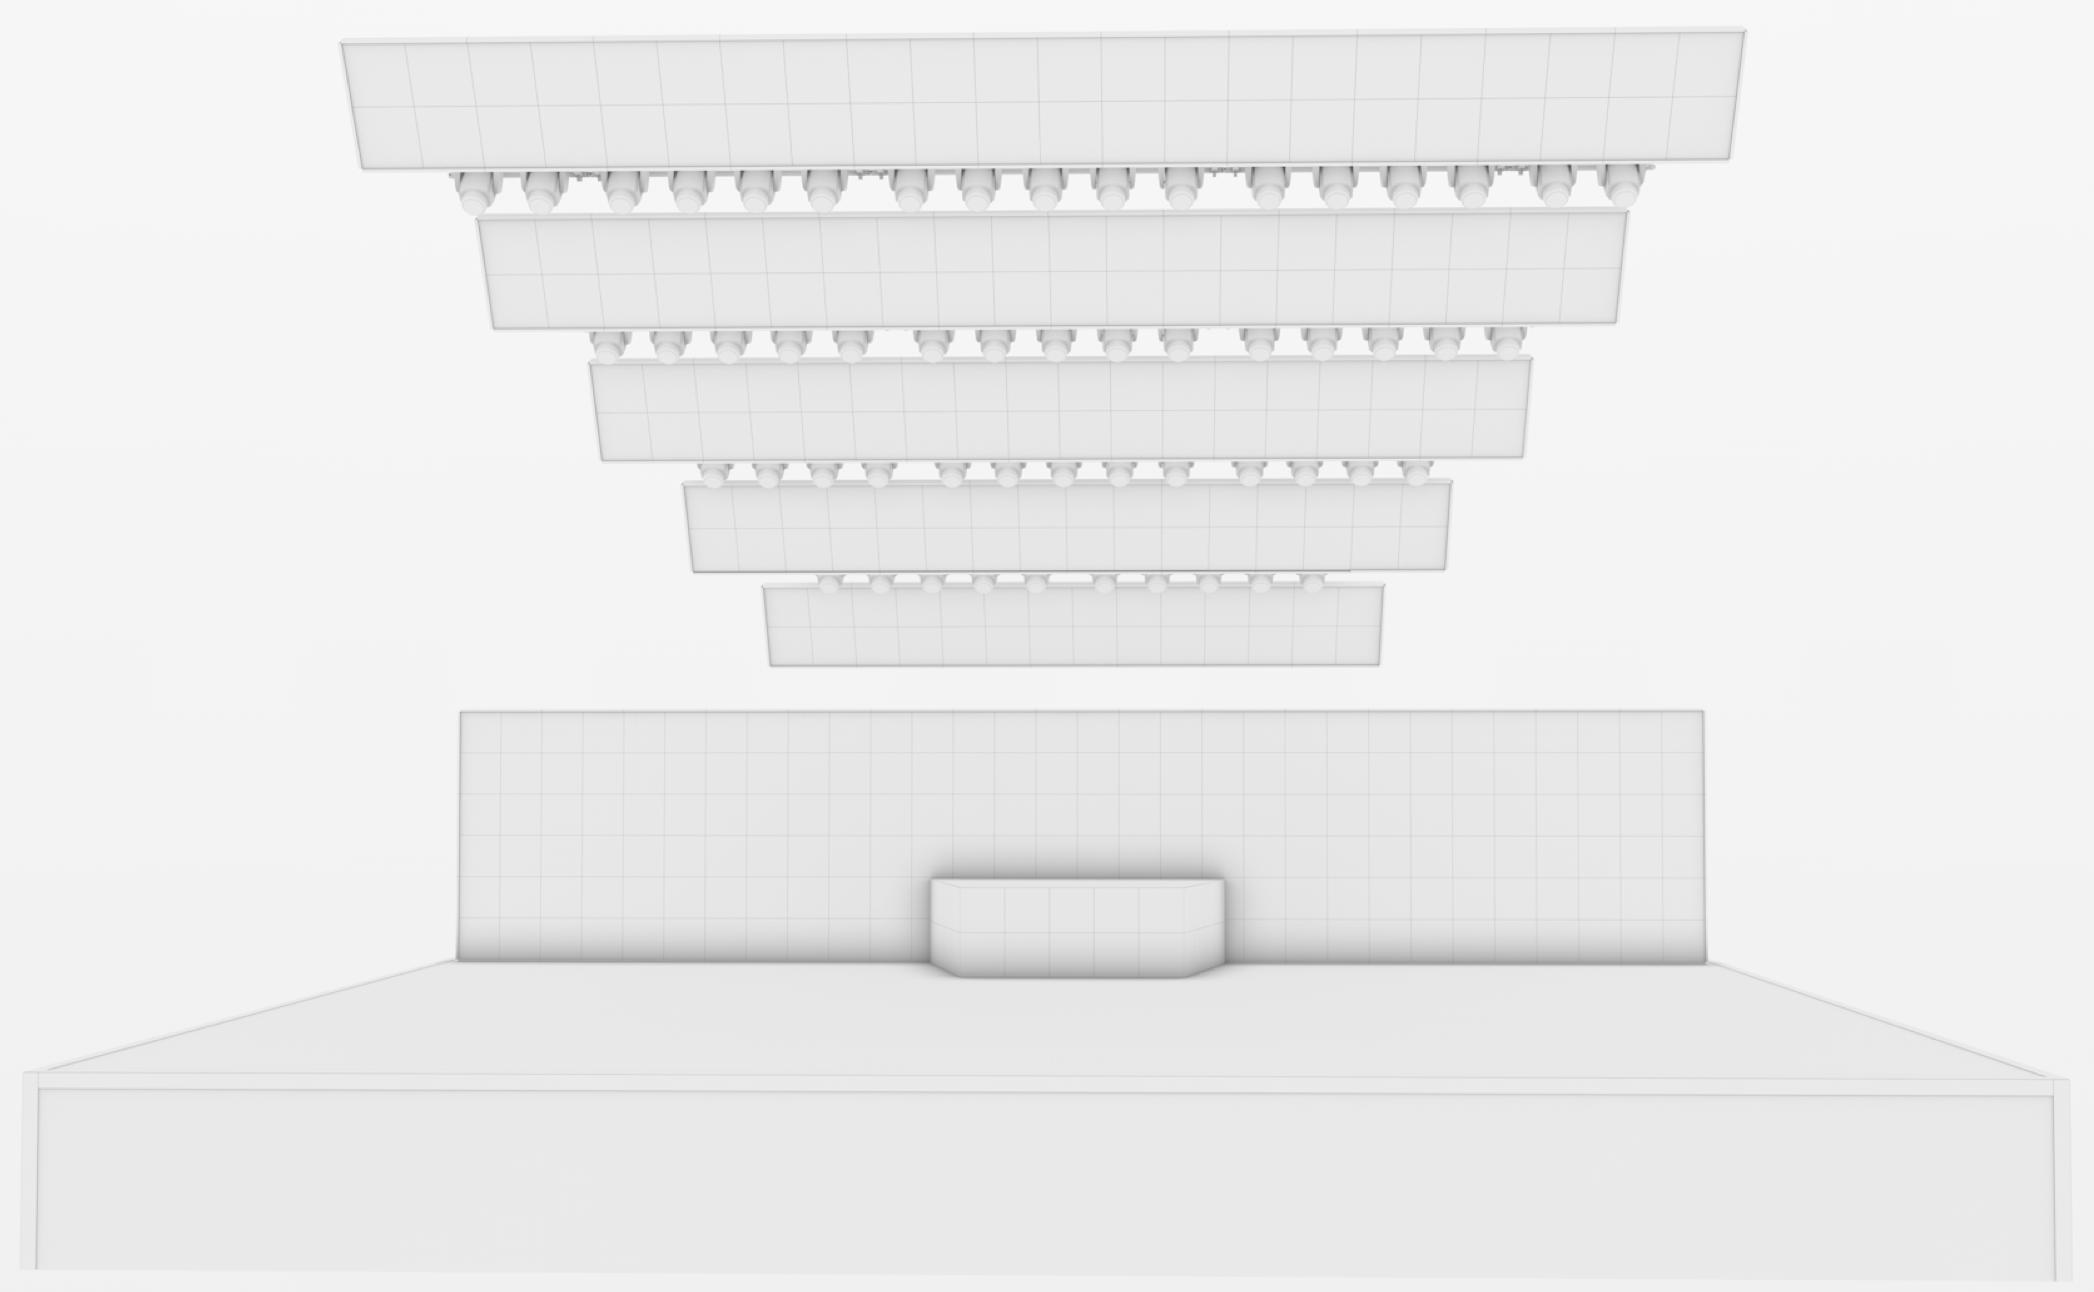 Modelbox Stage